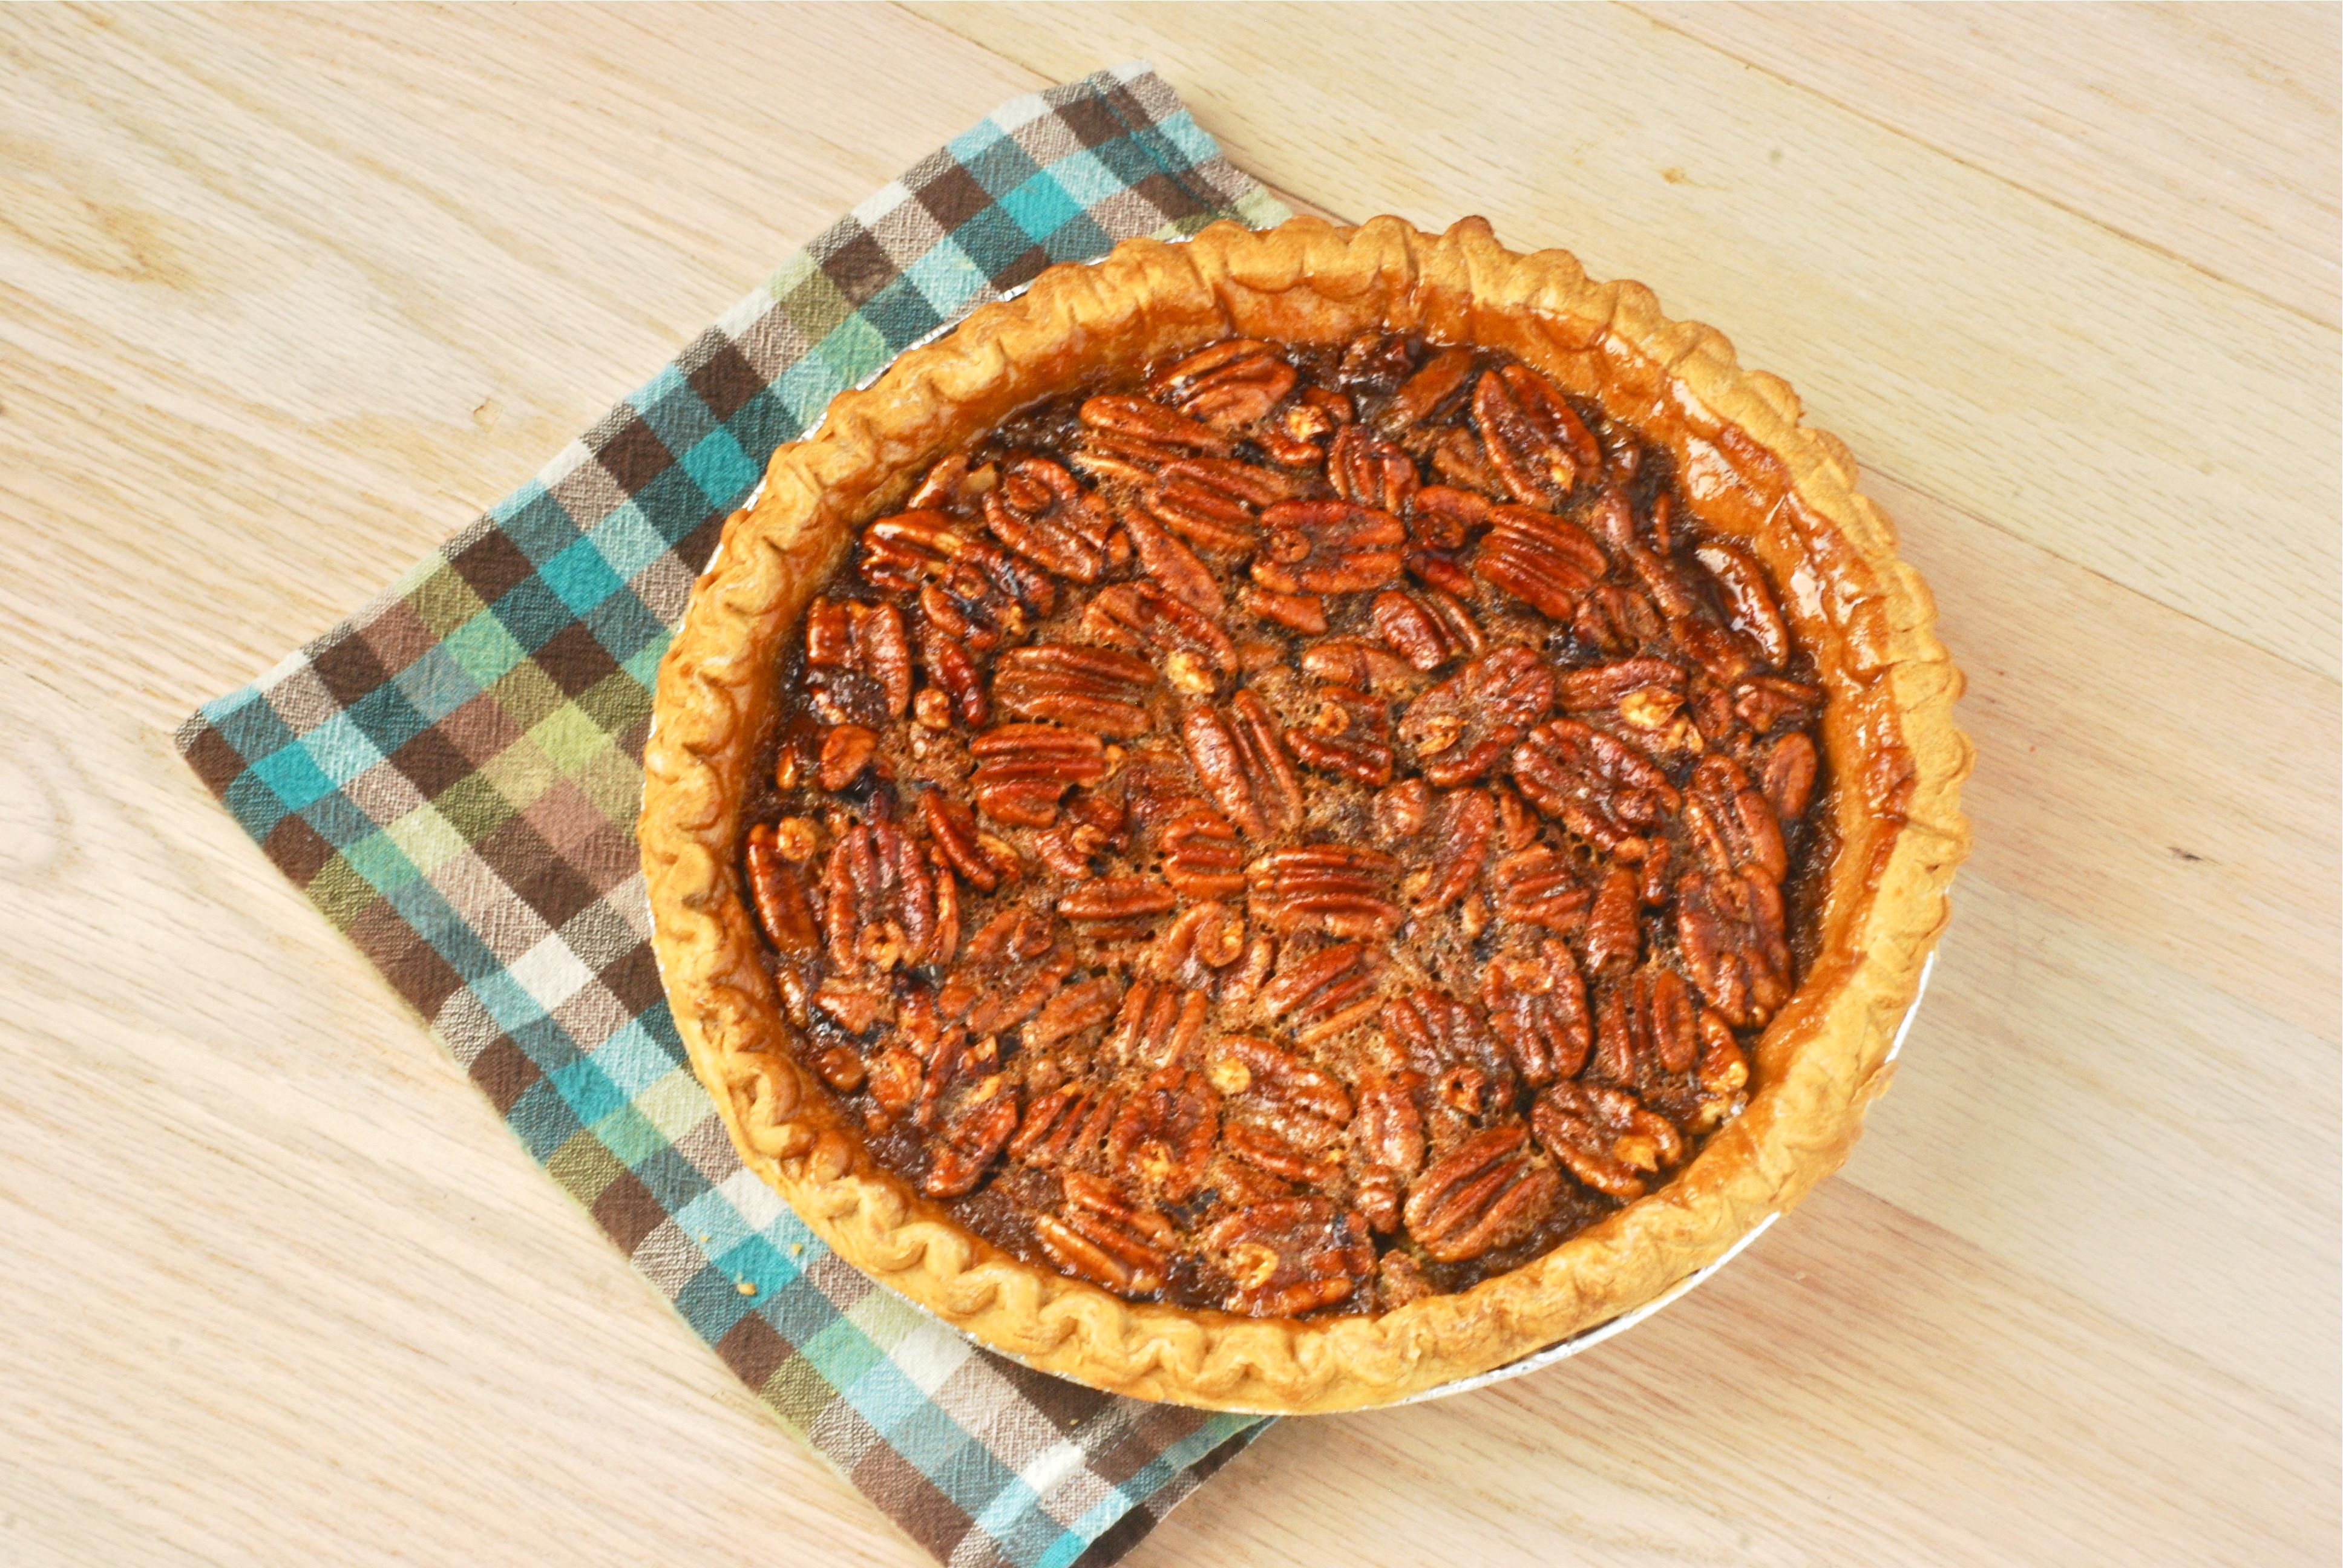 Karo Syrup Pecan Pie  Classic Pecan Pie Macaroni and Cheesecake